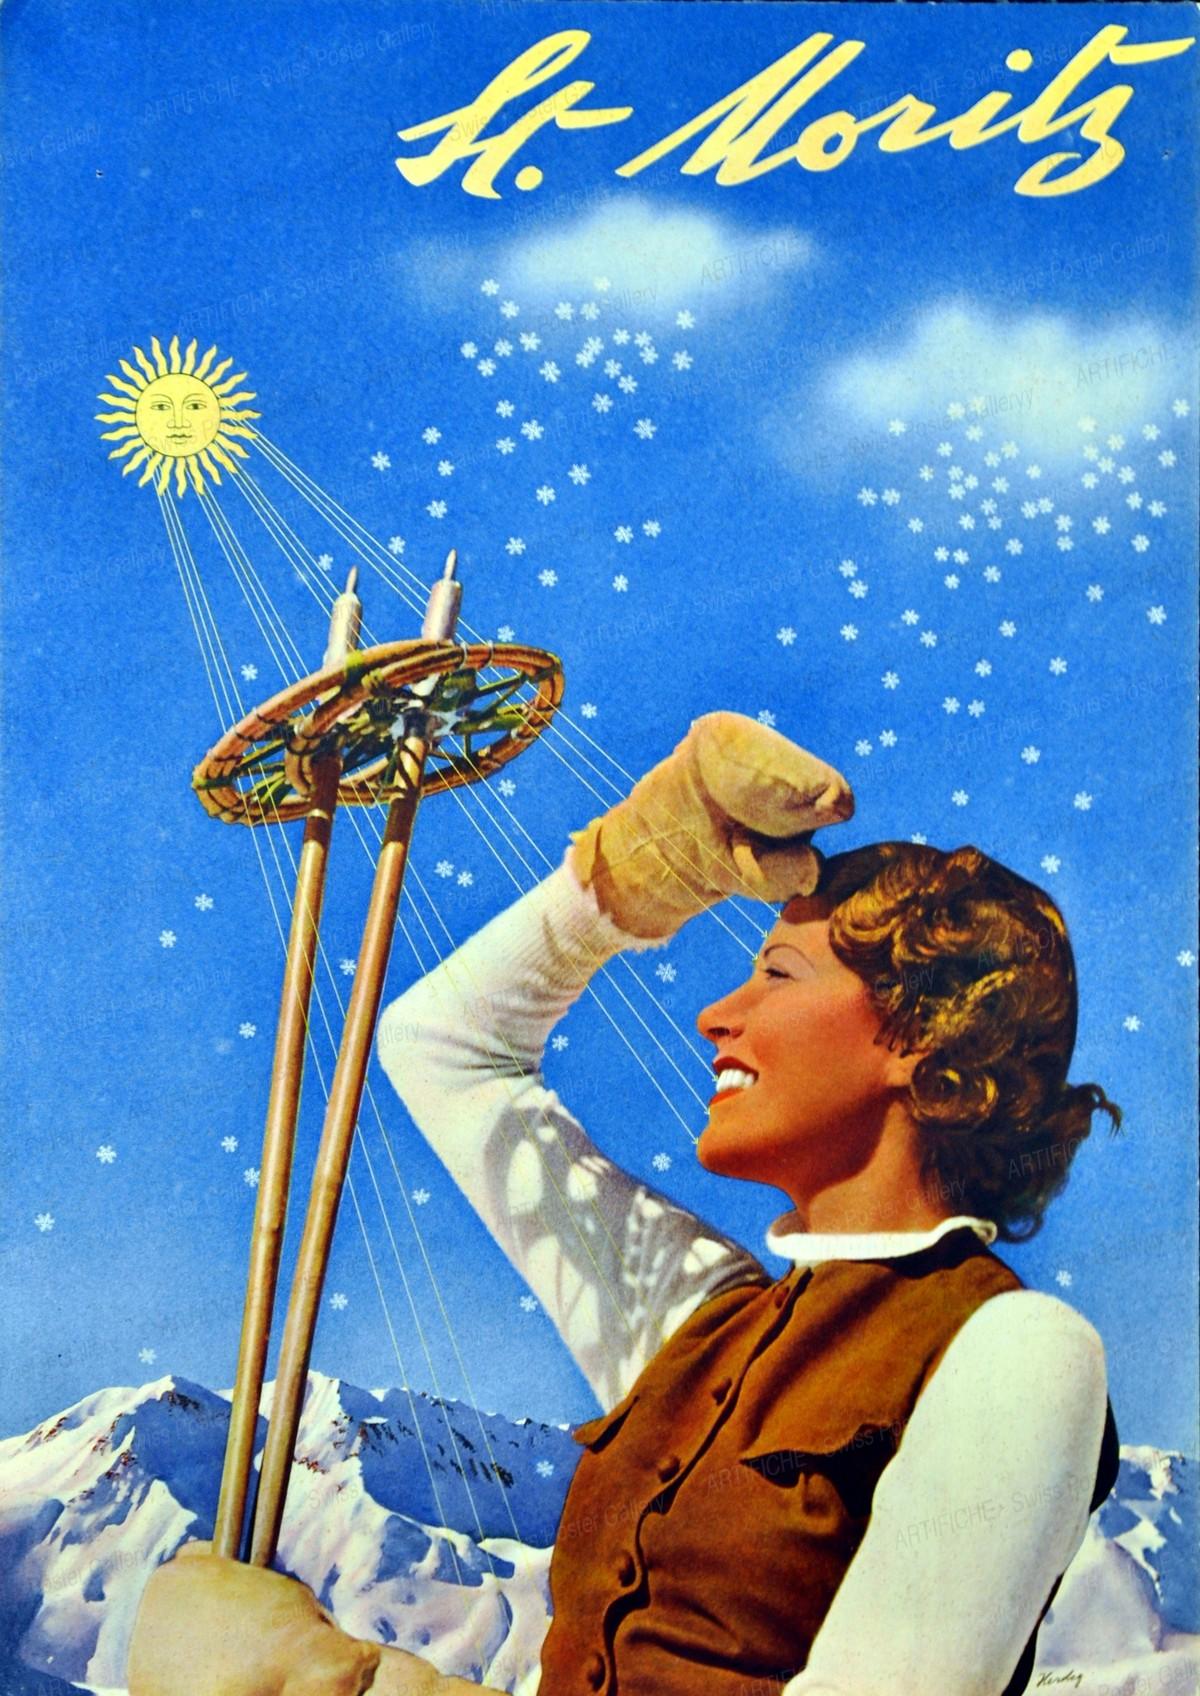 St. Moritz (vintage print ad, mounted; size 24,5 x 35 cm), Walter Herdeg